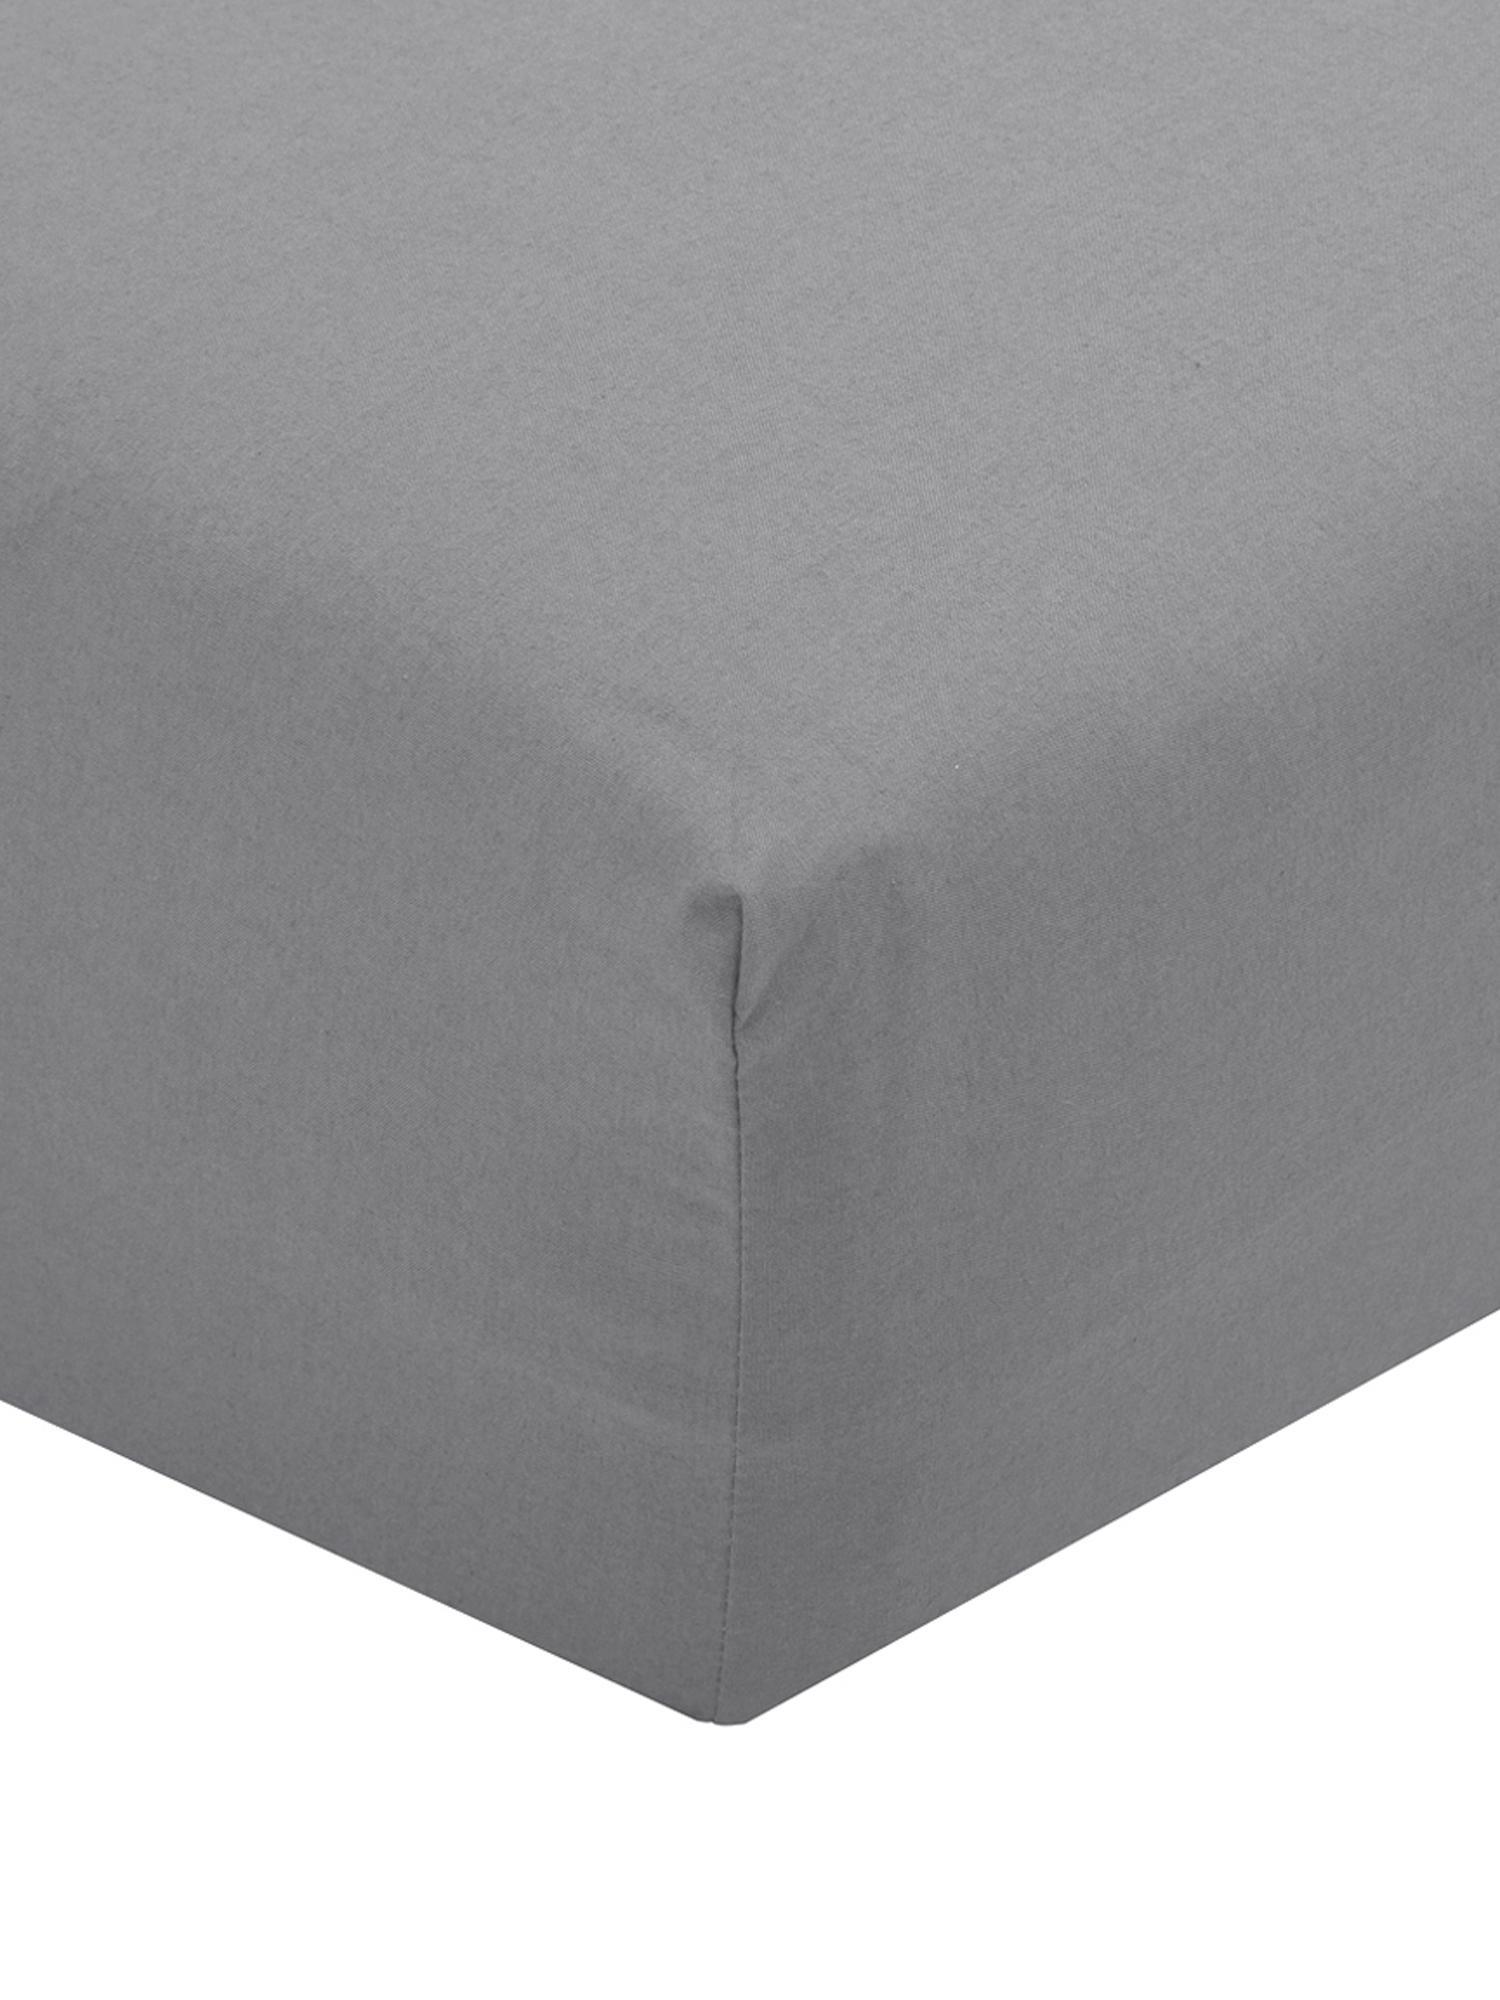 Lenzuolo con angoli in percalle Elsie, Tessuto: percalle, Grigio scuro, Larg. 90 x Lung. 200 cm